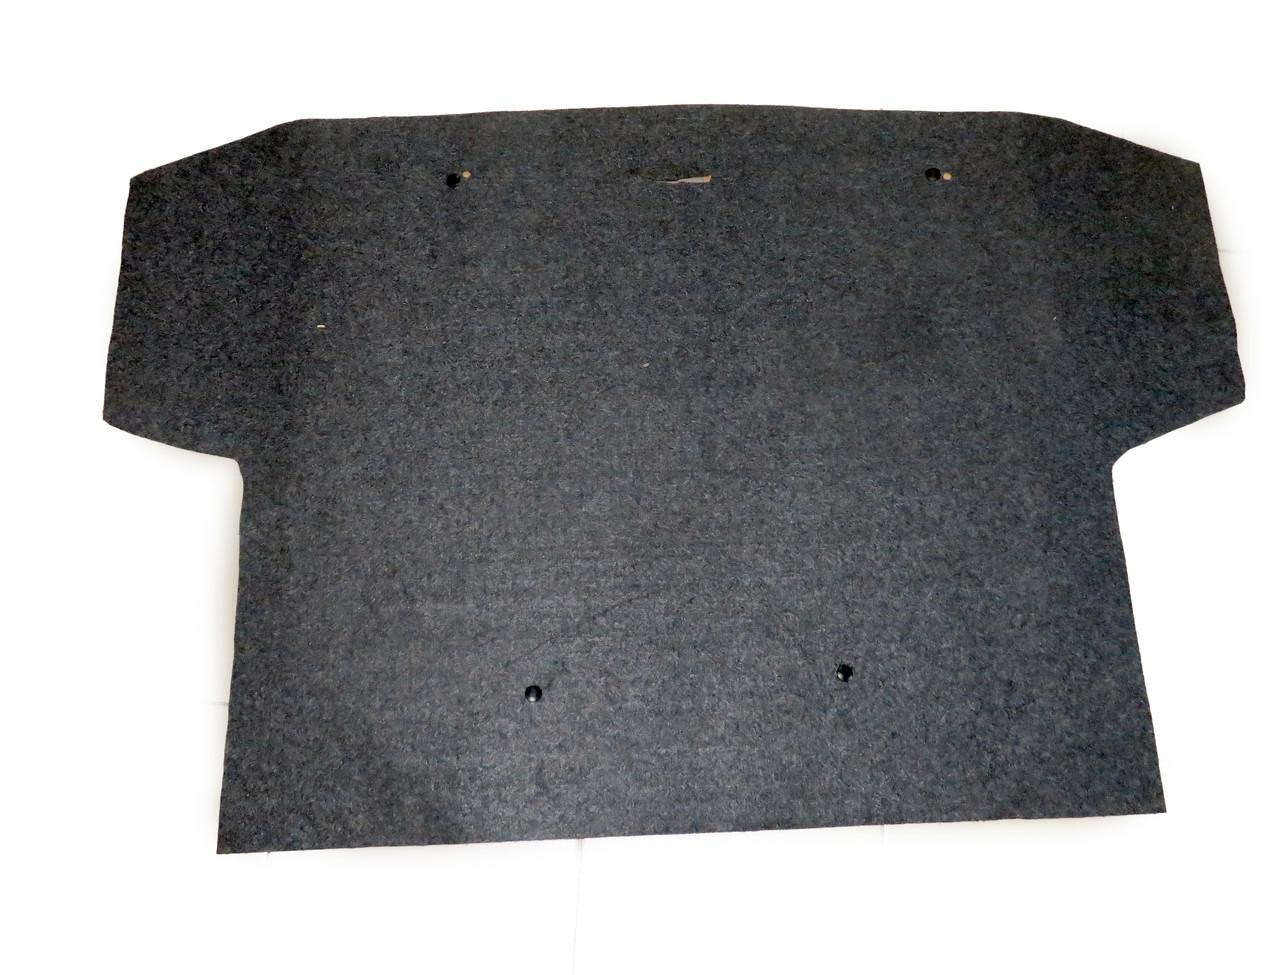 Ковер пола багажника Авео / Aveo, 96438753